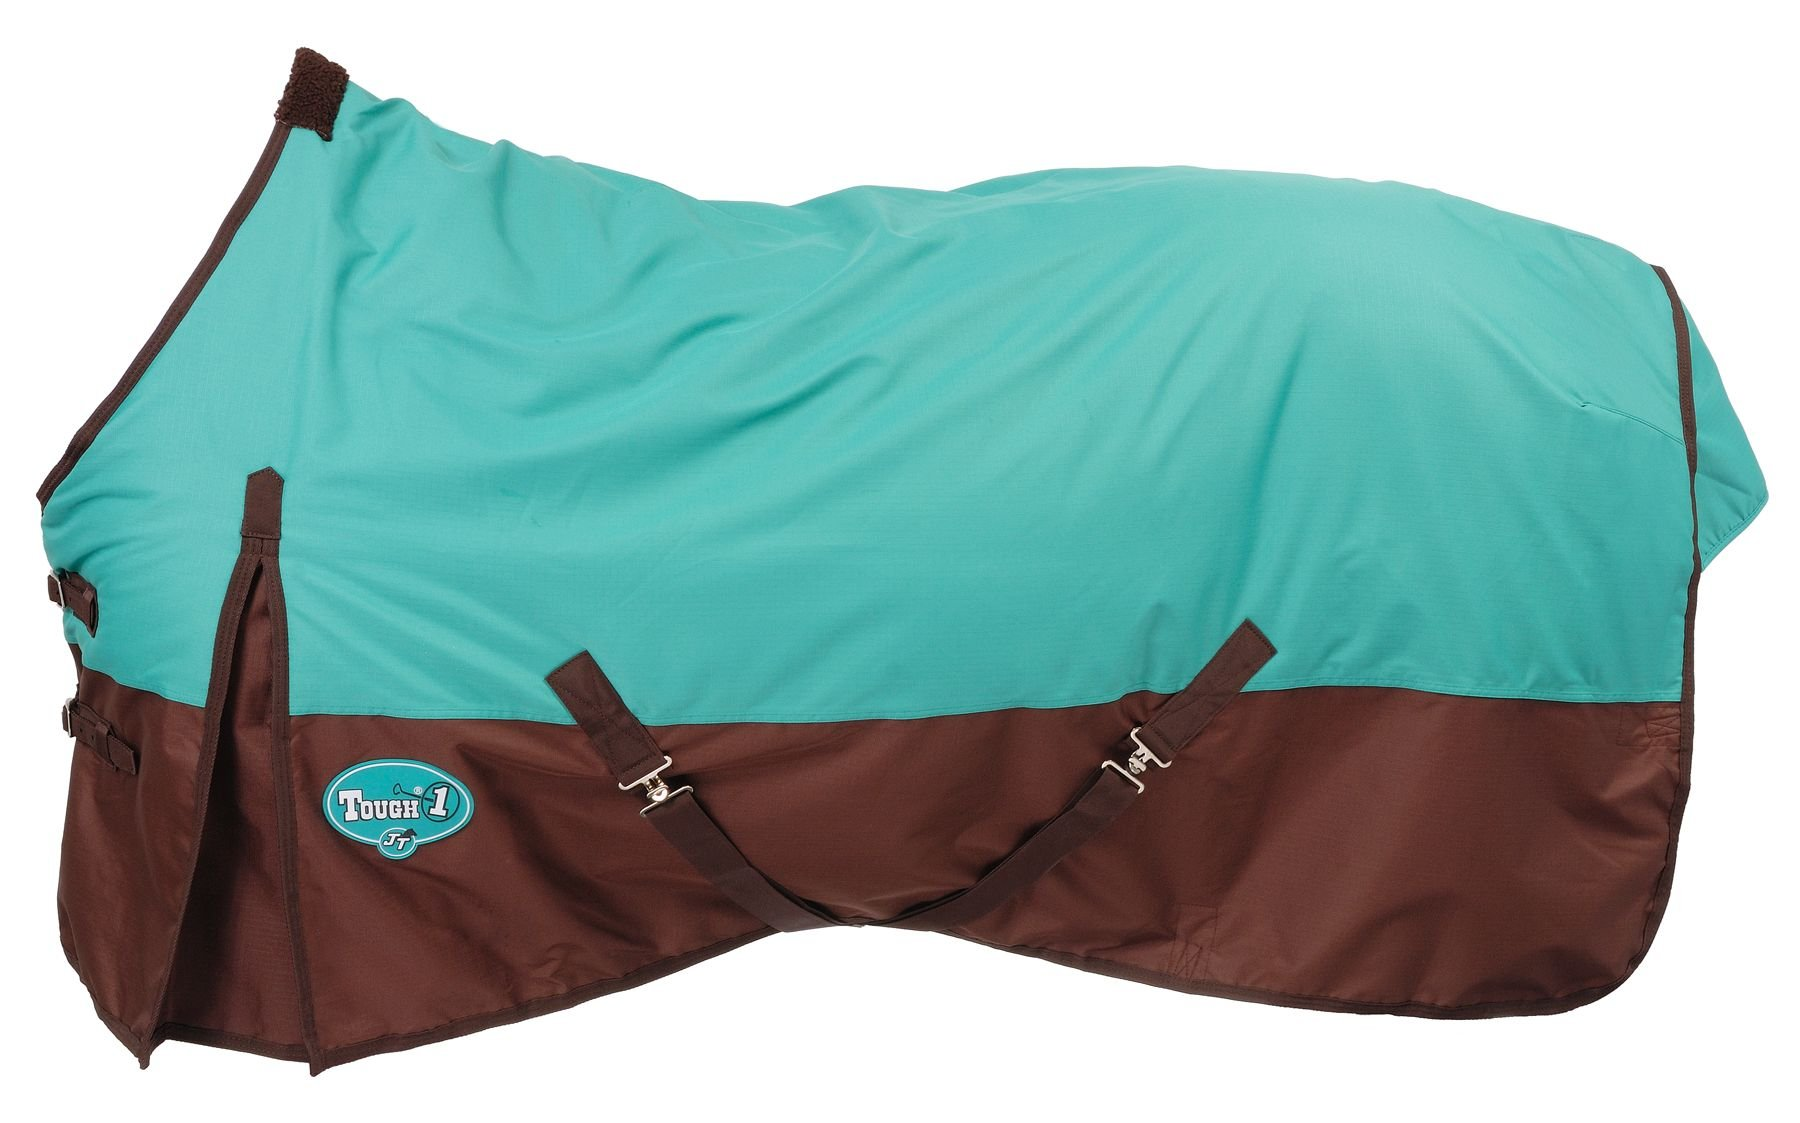 Tough 1 600 Denier Waterproof Horse Sheet, Turquoise/Brown, 72-Inch by Tough 1